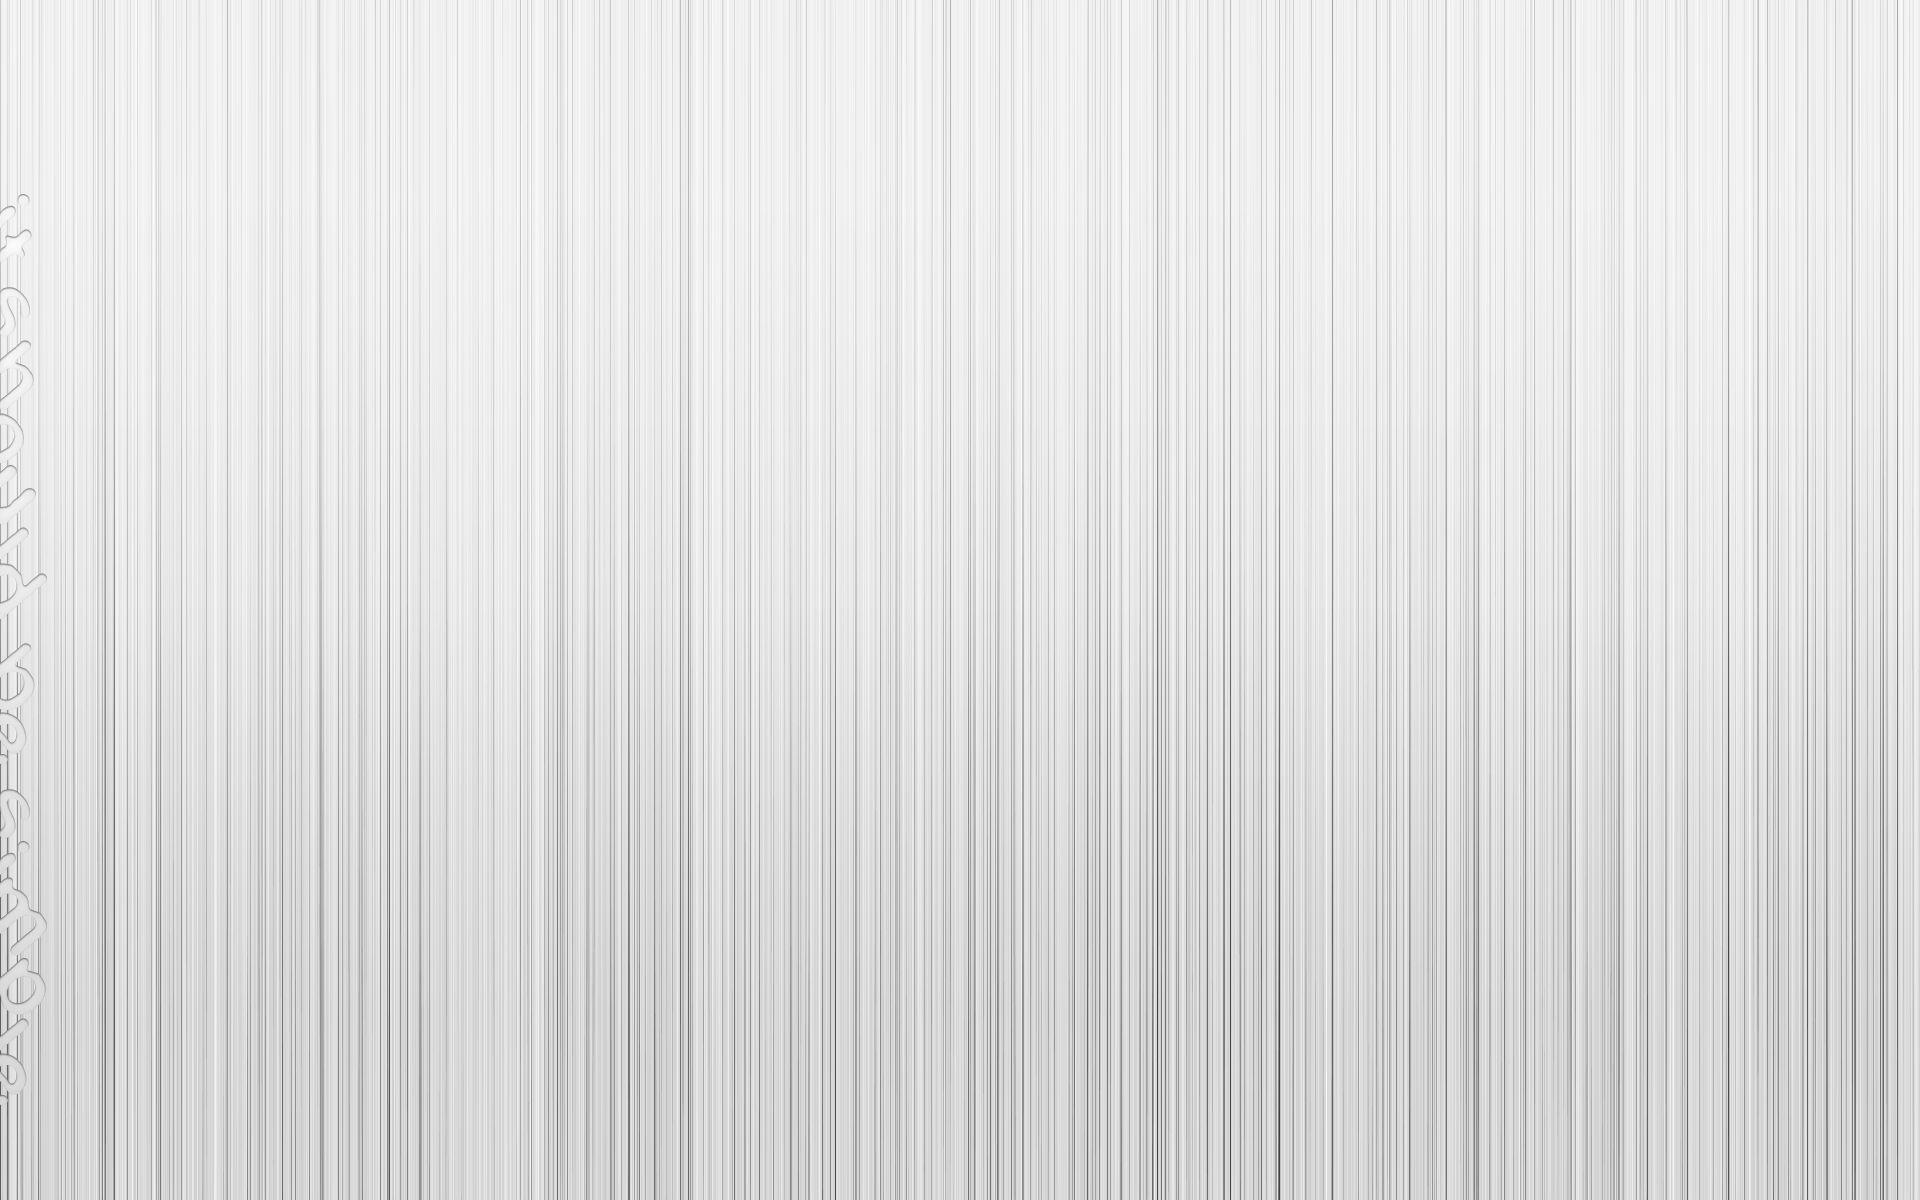 White Plain Wallpaper Hd Wallpaper Pinterest